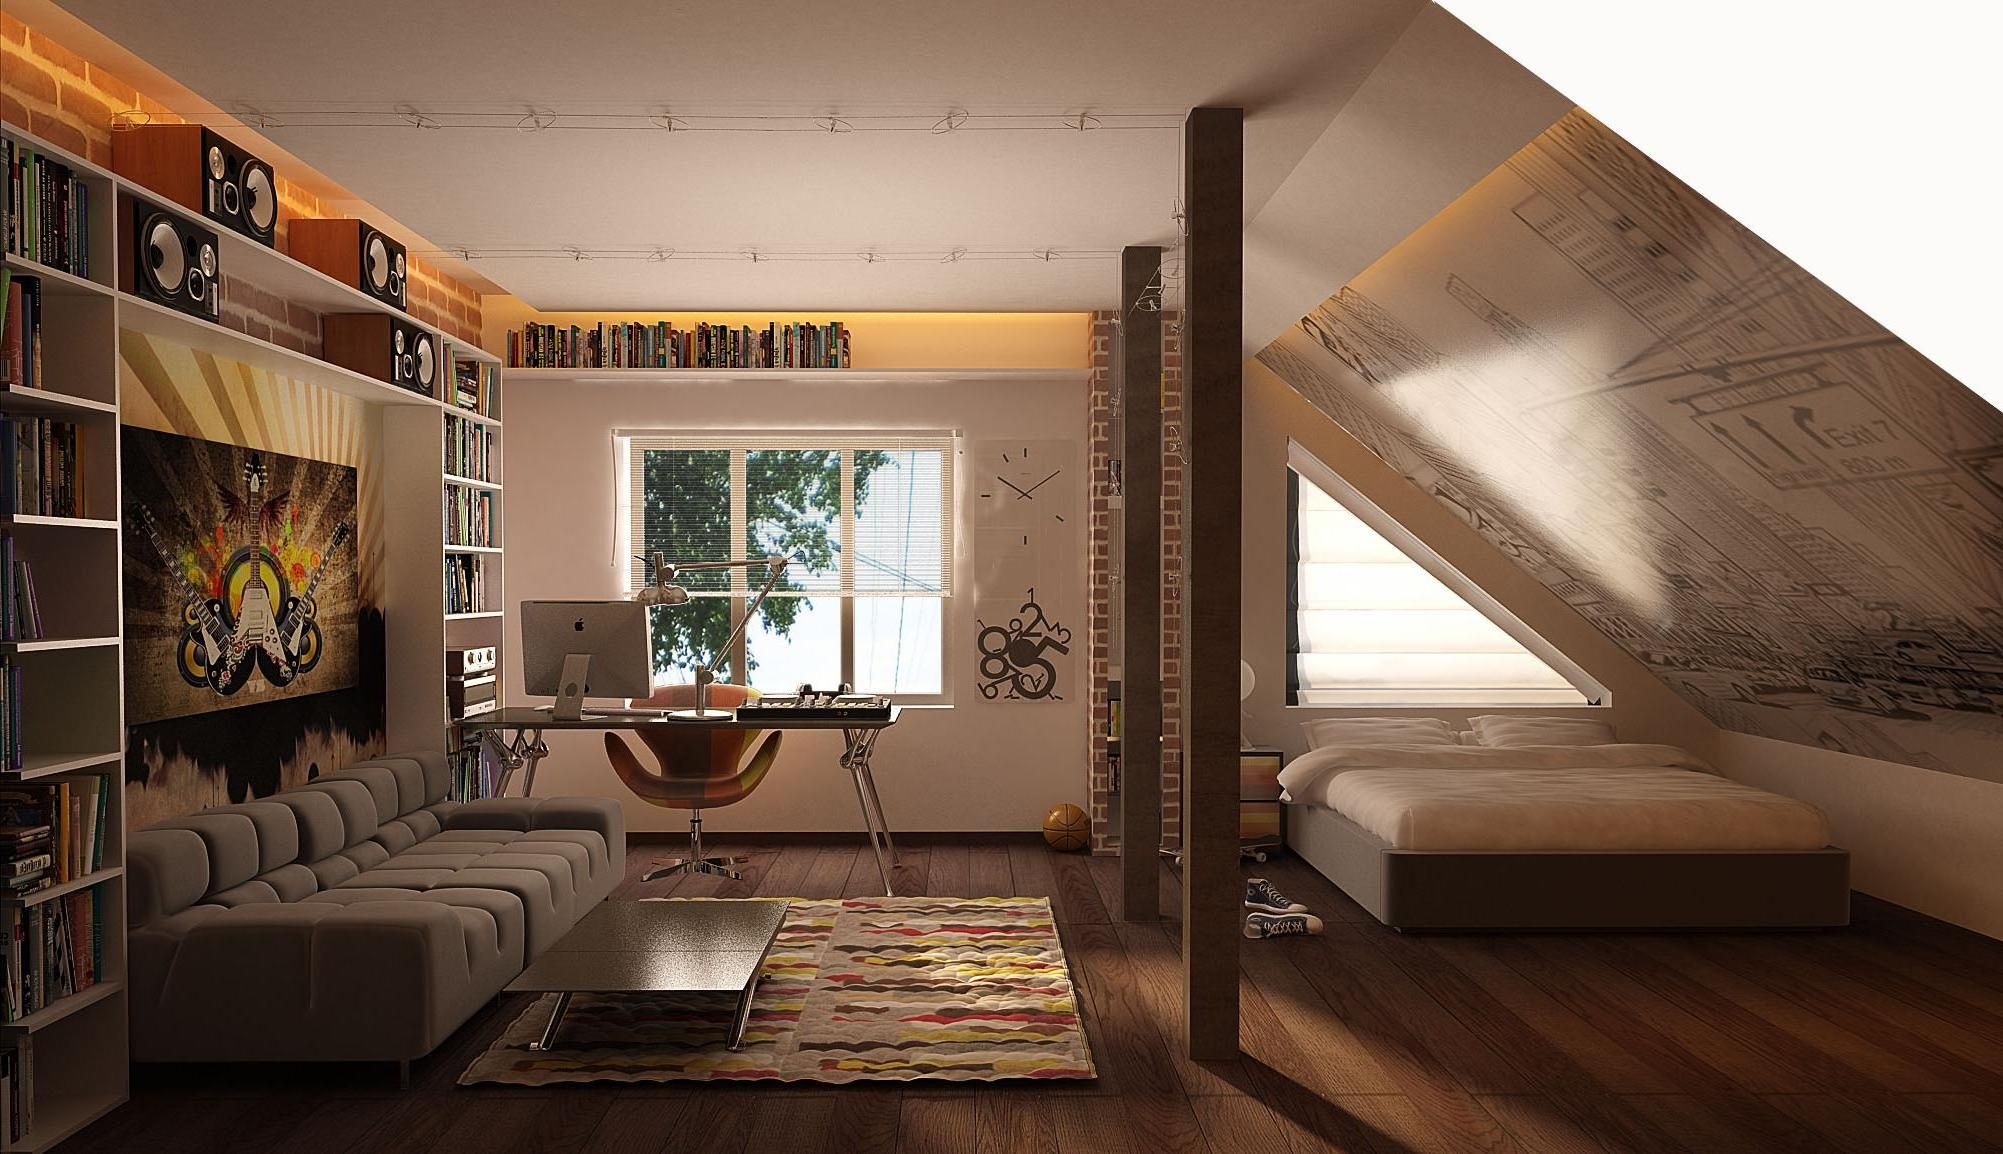 Attic Bed interesting small attic bed room idea with computer desk also long